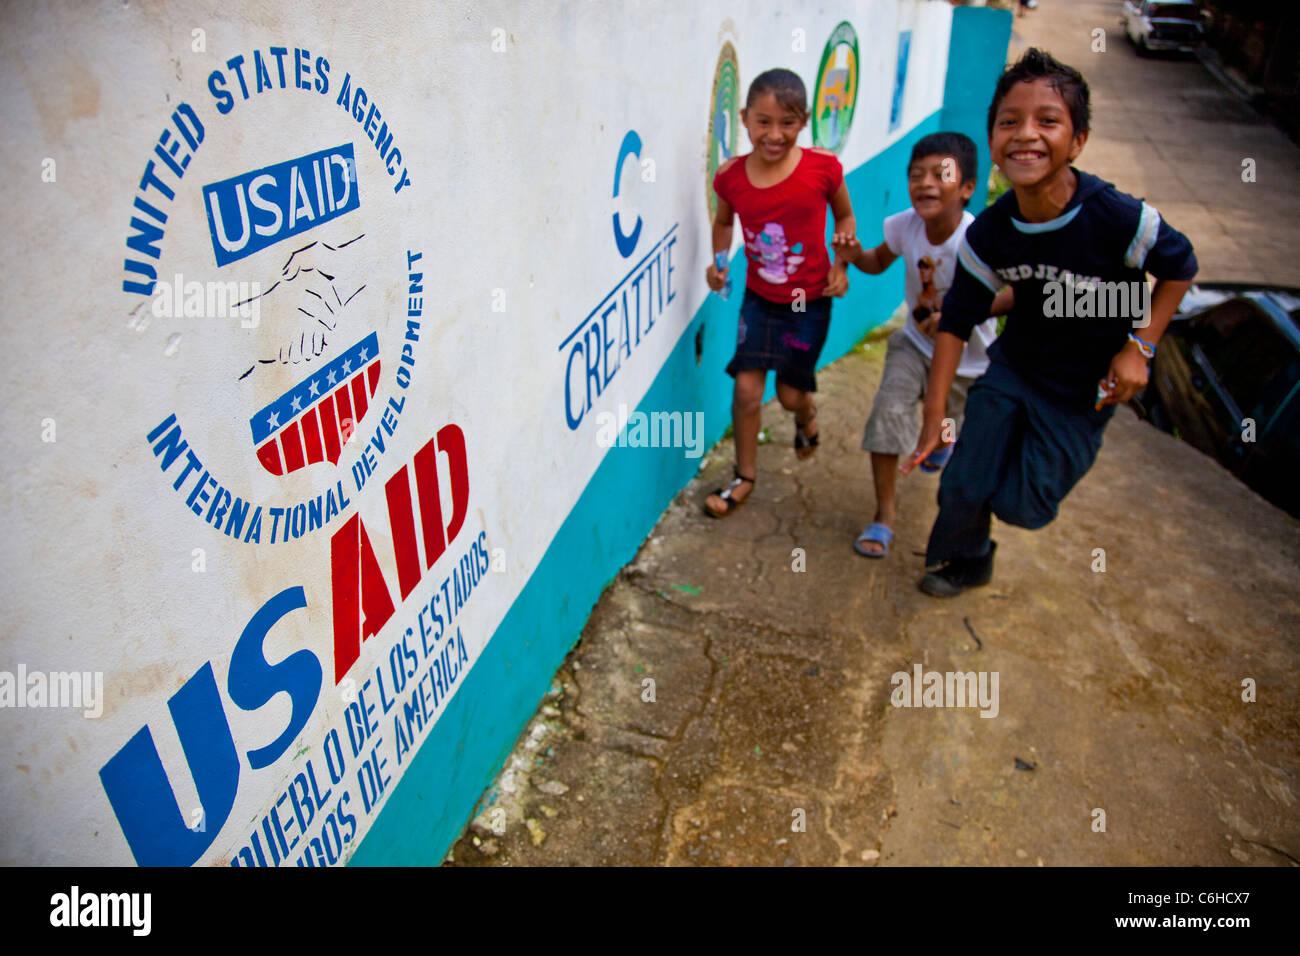 USAID development youth project , Por Mi Barrio, against gangs, San Salvador, El Salvador - Stock Image